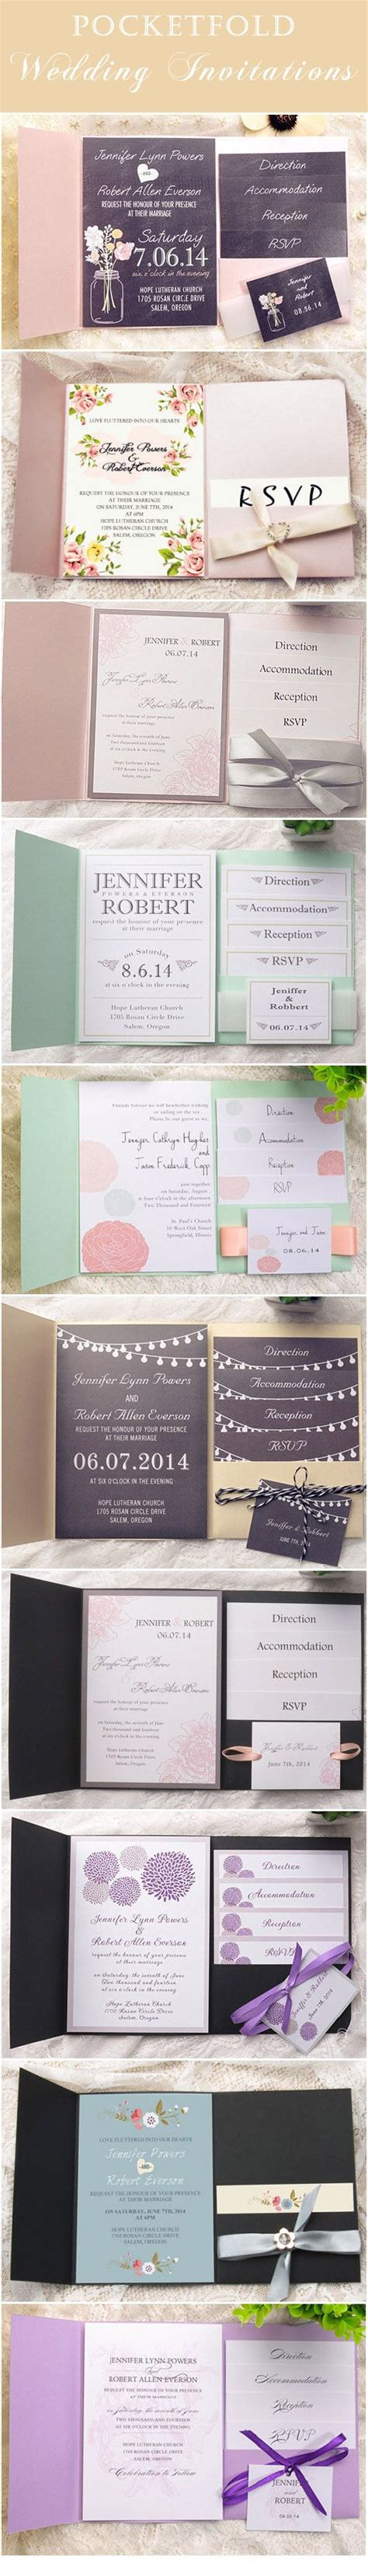 free sle pocket wedding invitations 25 best ideas about wedding response cards on